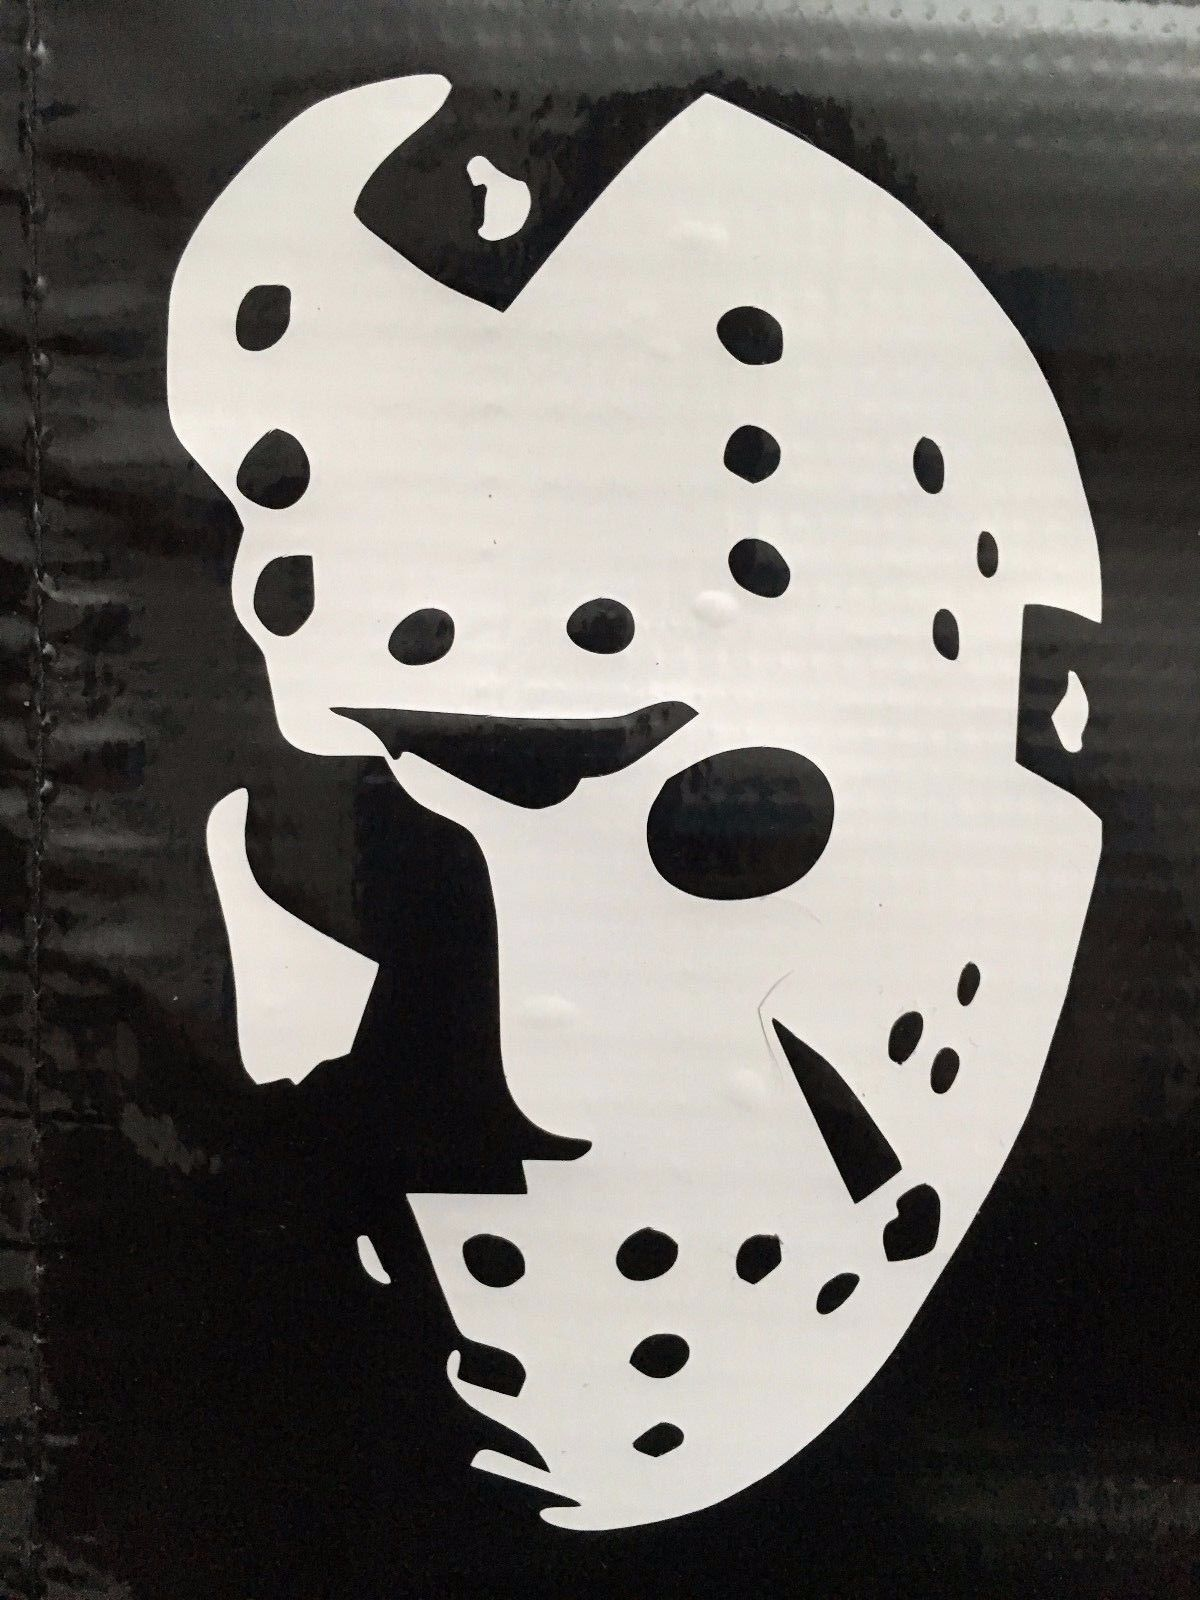 Jason Voorhees Halloween Friday The 13th Horror Decal Sticker 5 Halloween Stencils Halloween Friday The 13th Jason Voorhees Drawing [ 1600 x 1200 Pixel ]